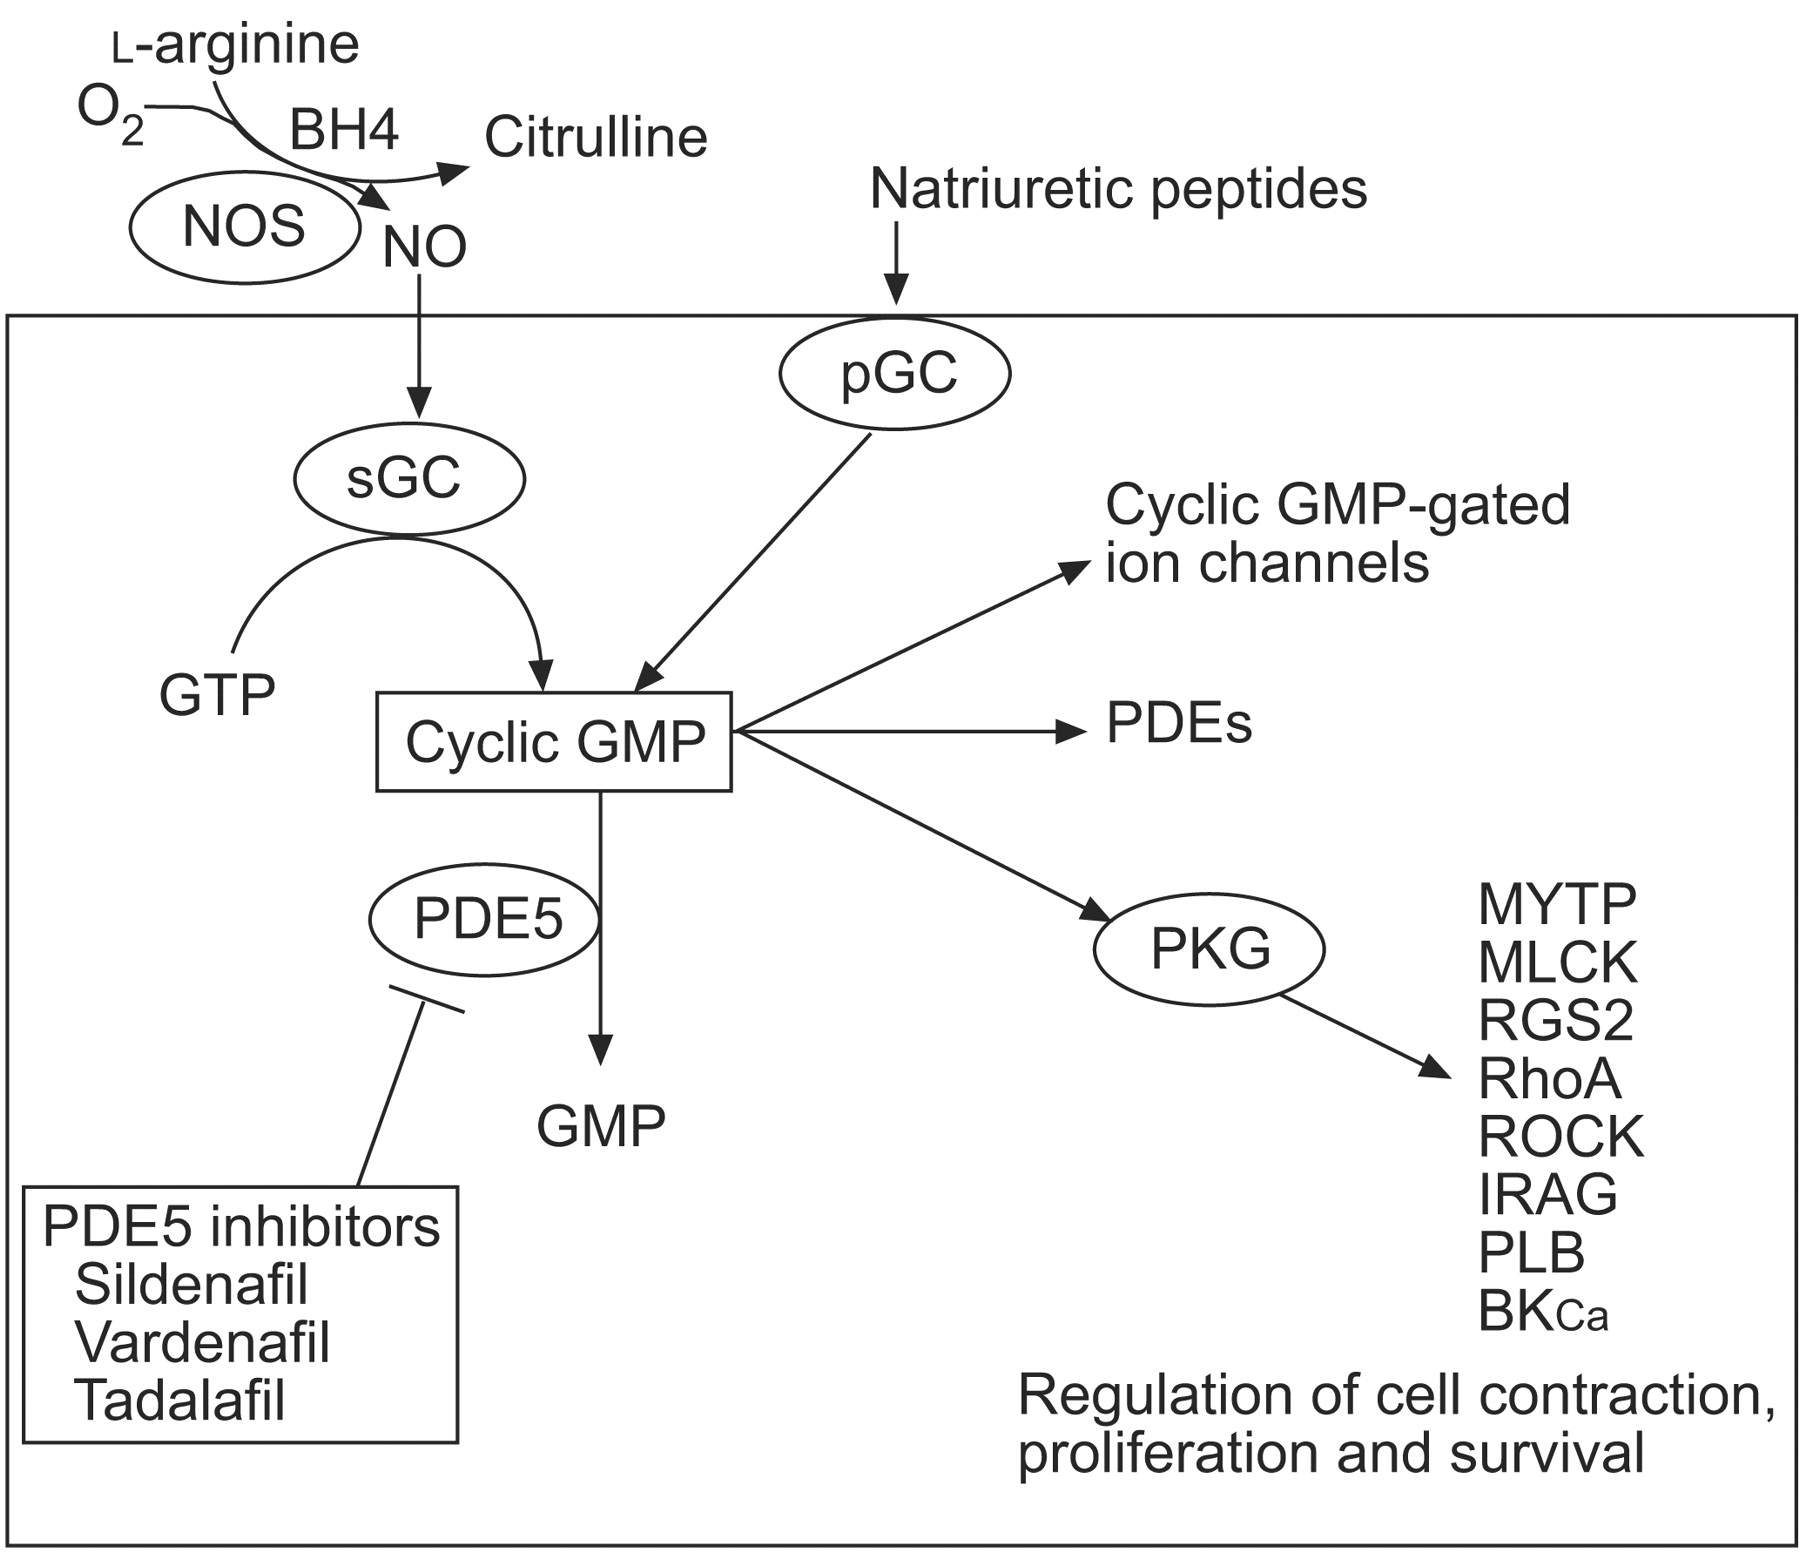 Pde5 inhibitor vardenafil and tadalafil cialis red eyes